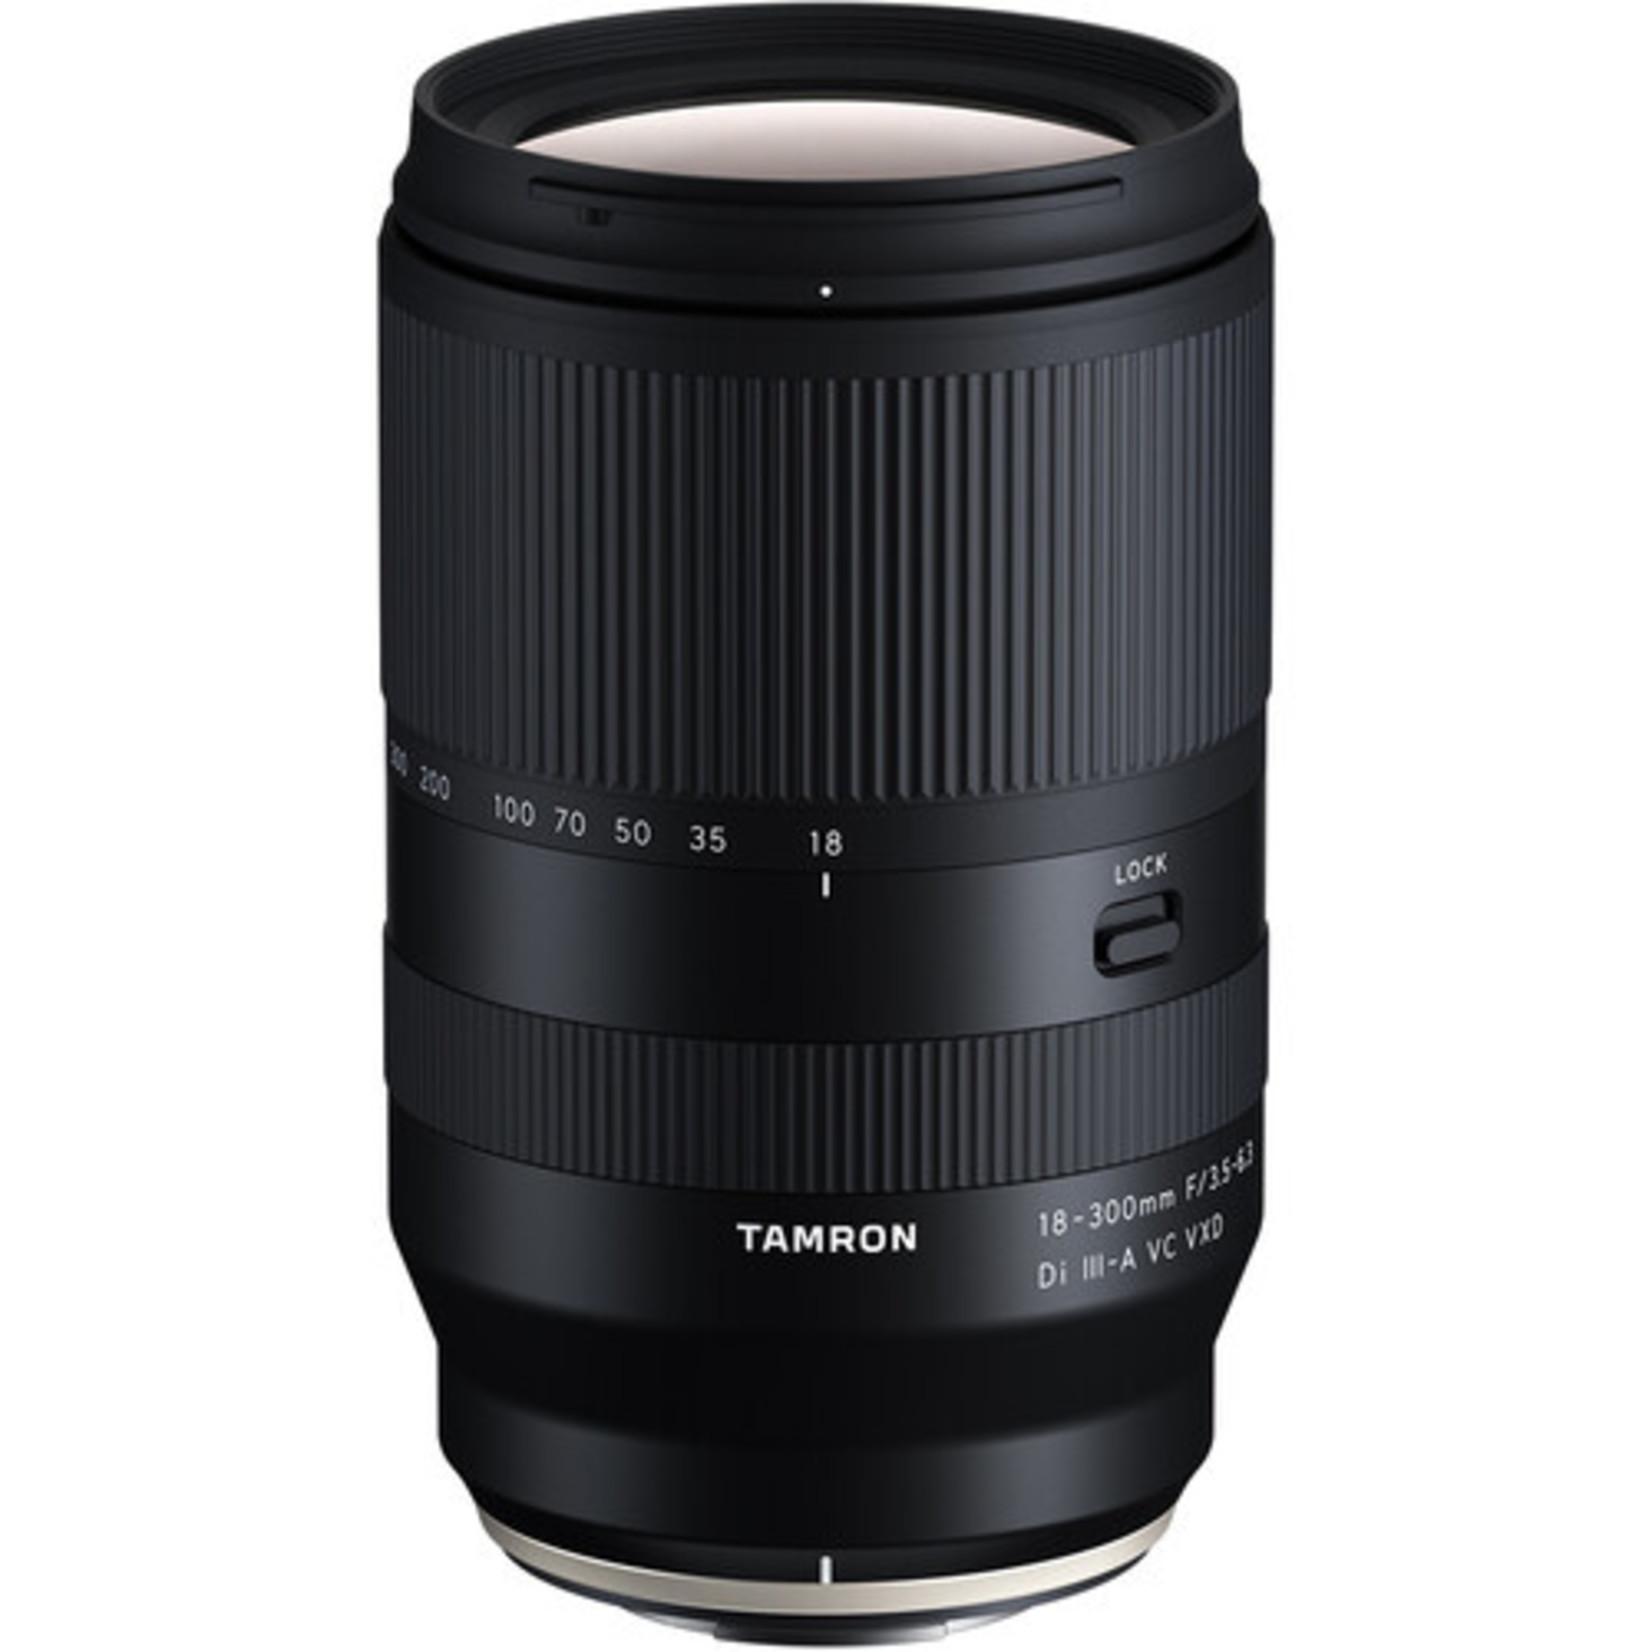 Tamron Tamron 18-300mm f/3.5-6.3 Di III-A VC VXD Lens for FUJIFILM X